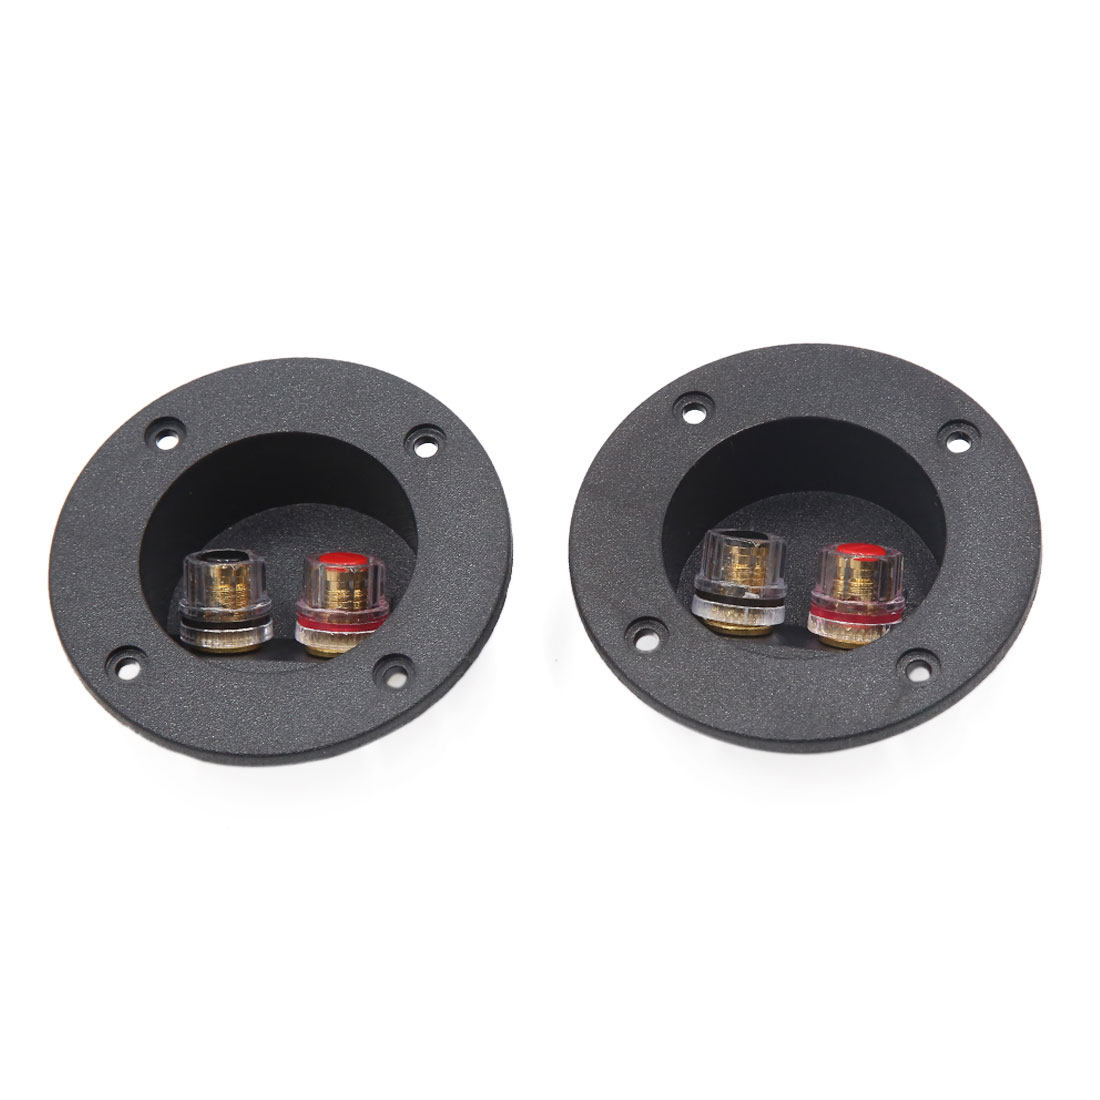 2Pcs Round Shape Car Audio Speaker Spring Binding Post Dual Terminal Connector Board